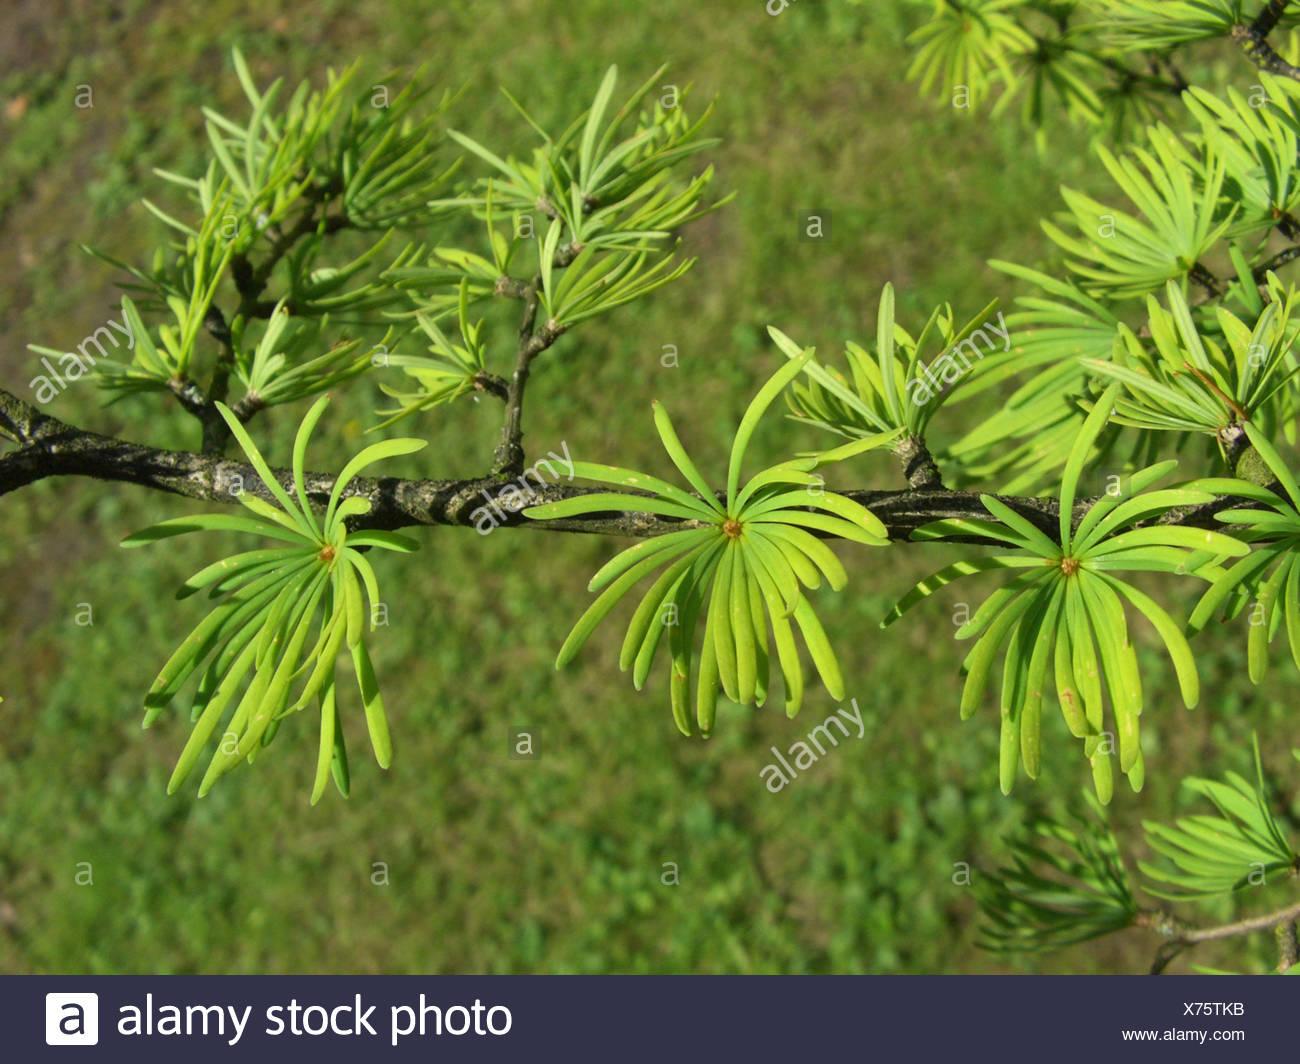 Golden Larch Pseudolarix Amabilis Pseudolarix Kaempferi Branch With Needles Stock Photo Alamy